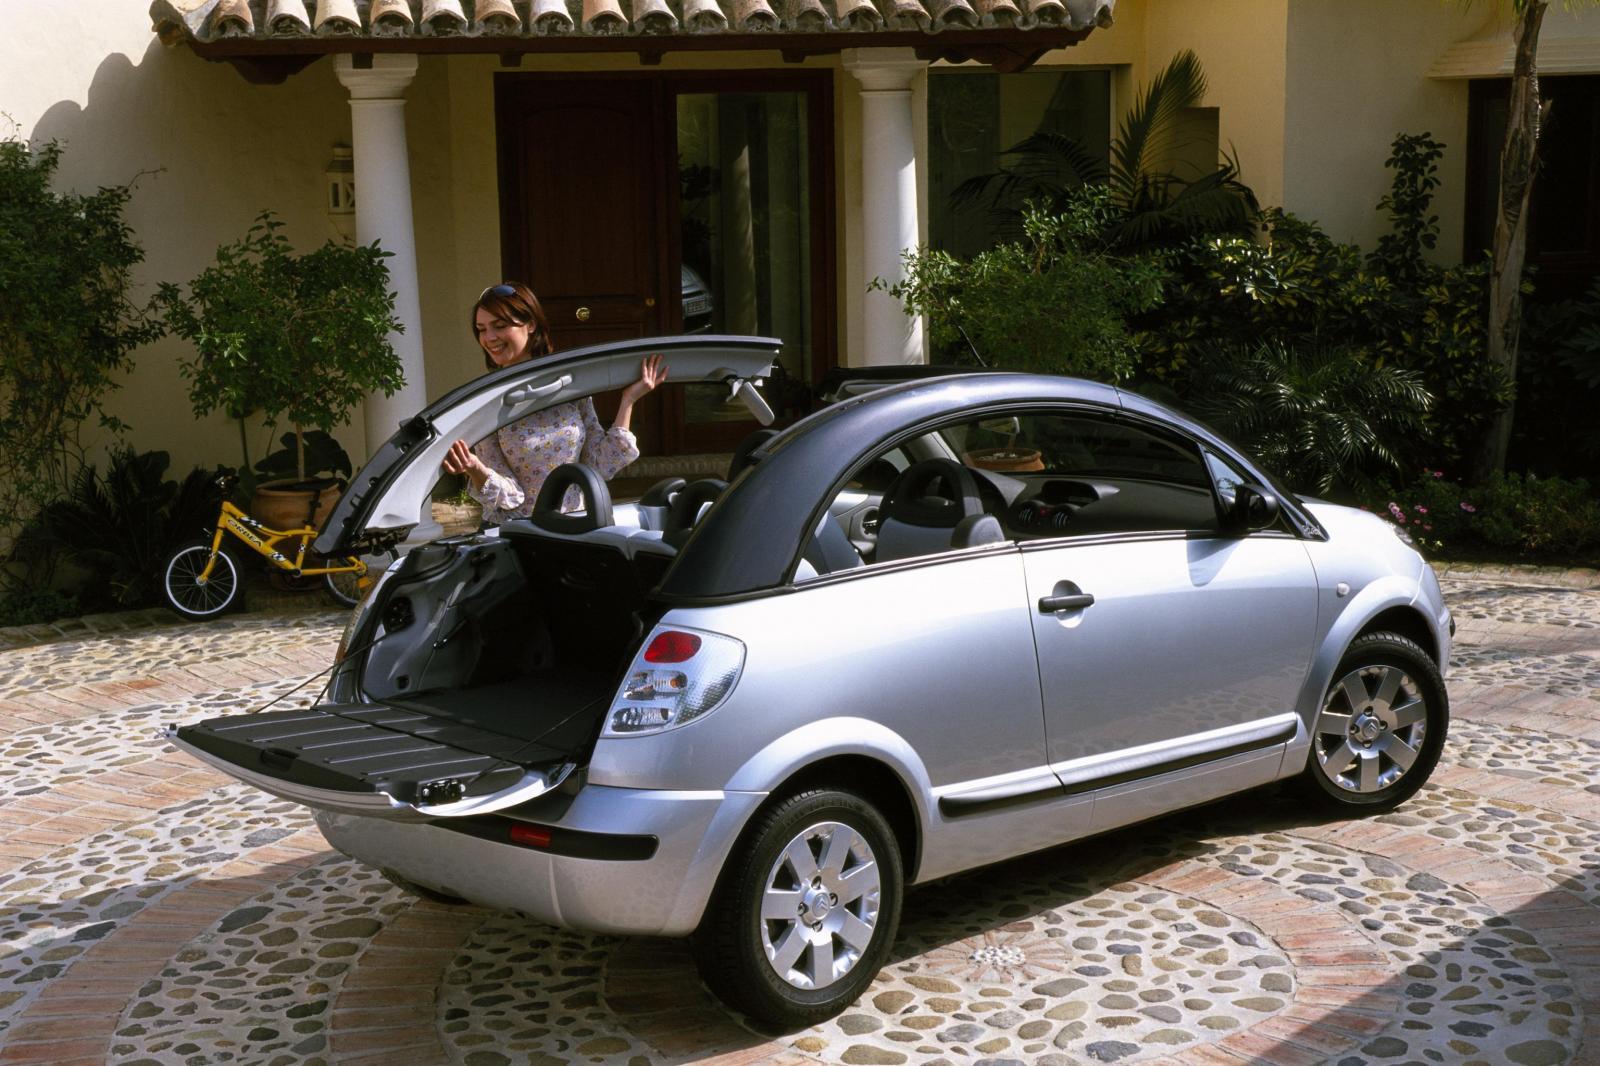 Citroen C3 I 2002 - 2006 Cabriolet #1